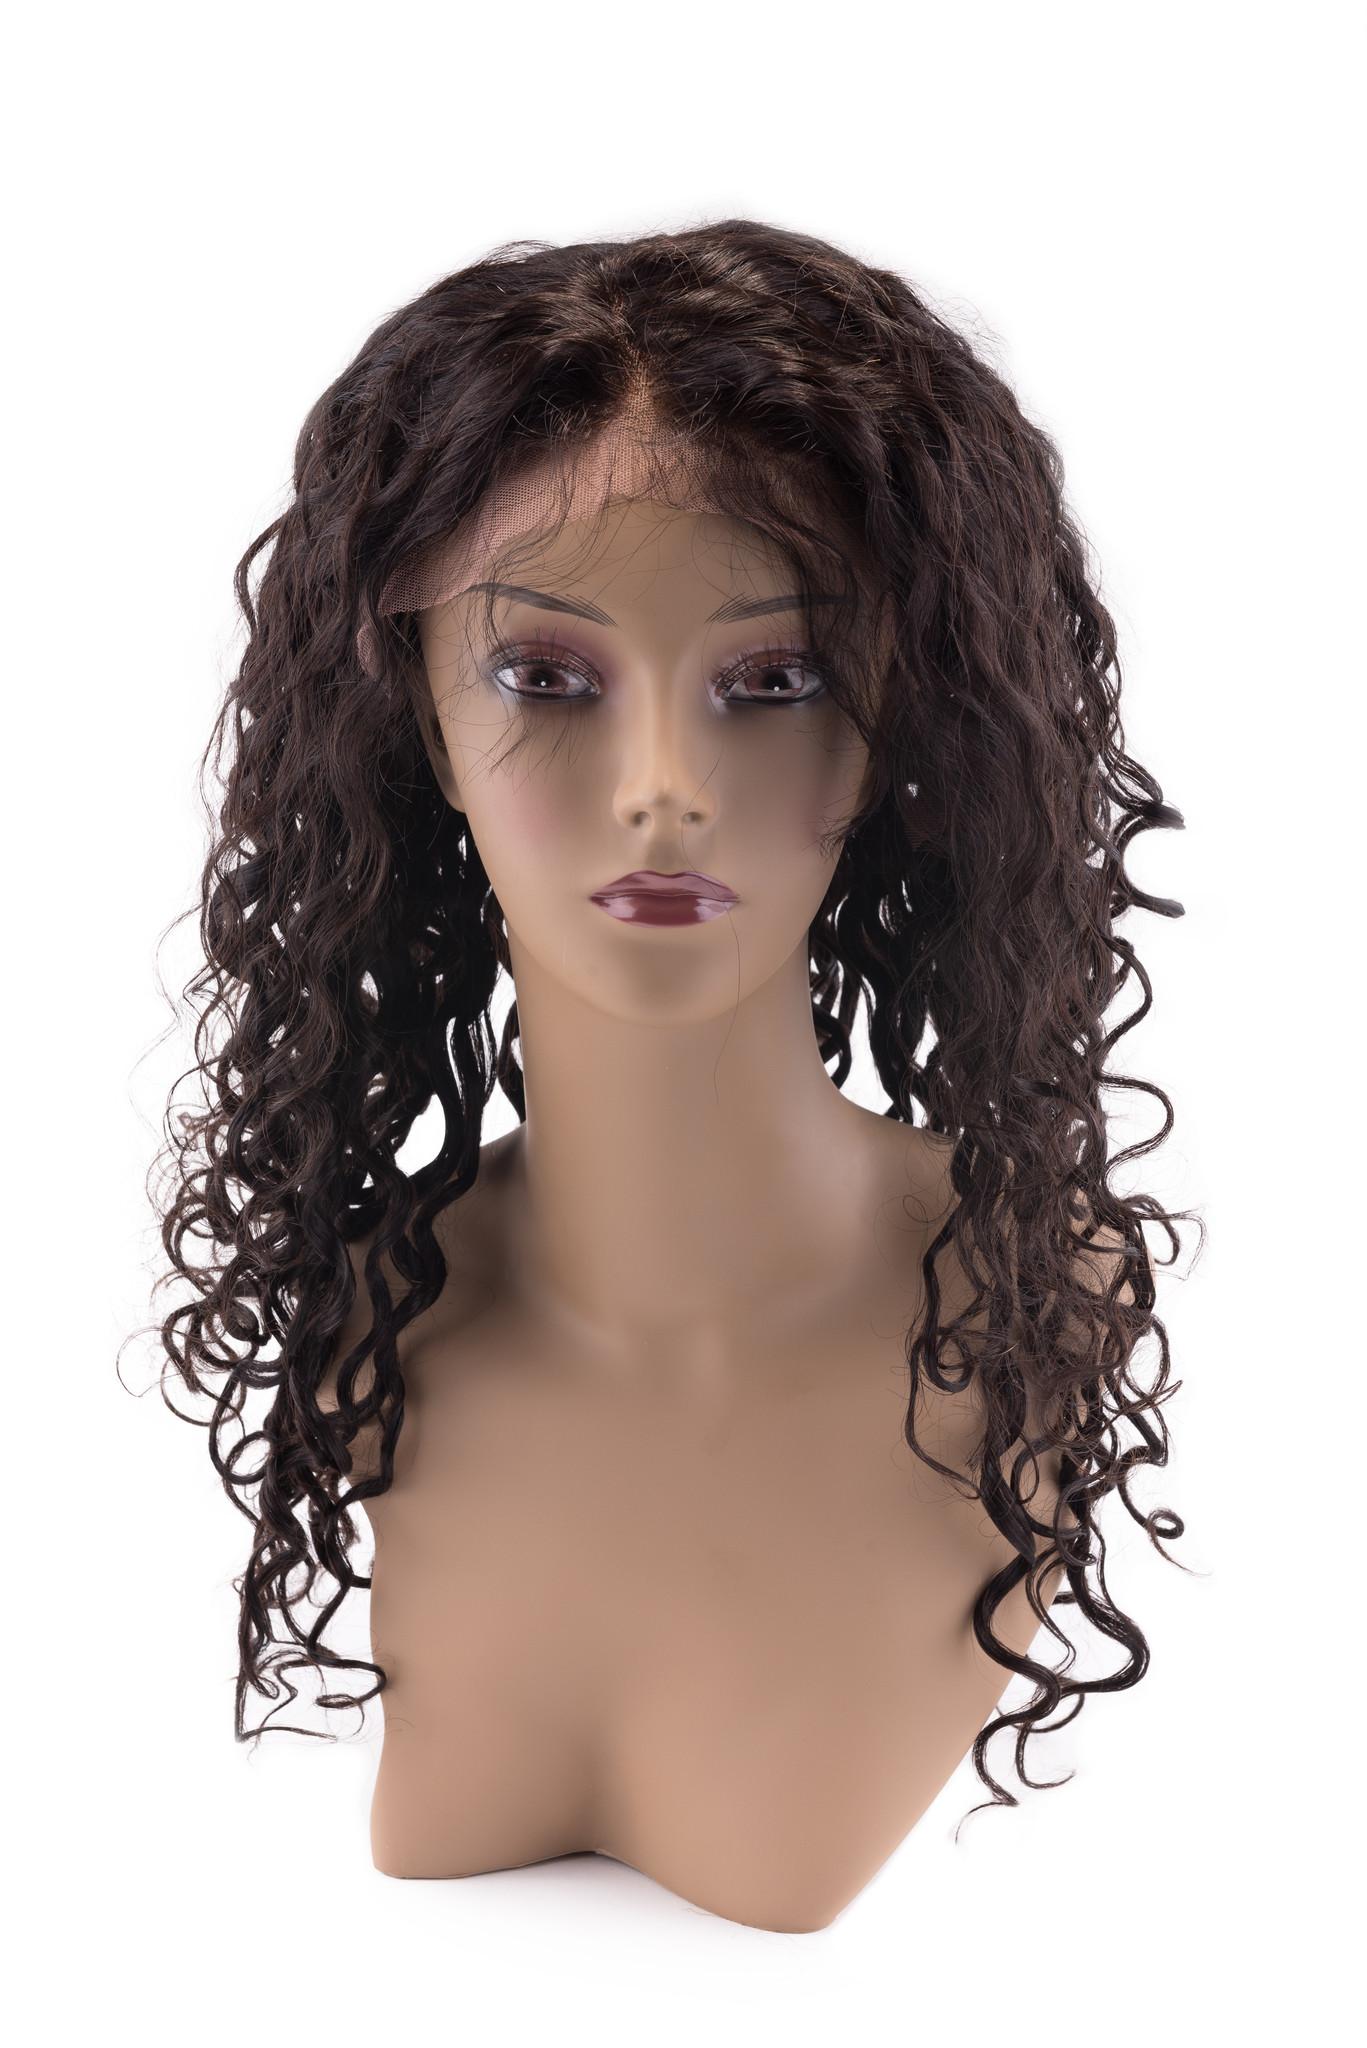 Shri SilverFox Shri Front Lace  Wig  -Semi Body Wave 24''